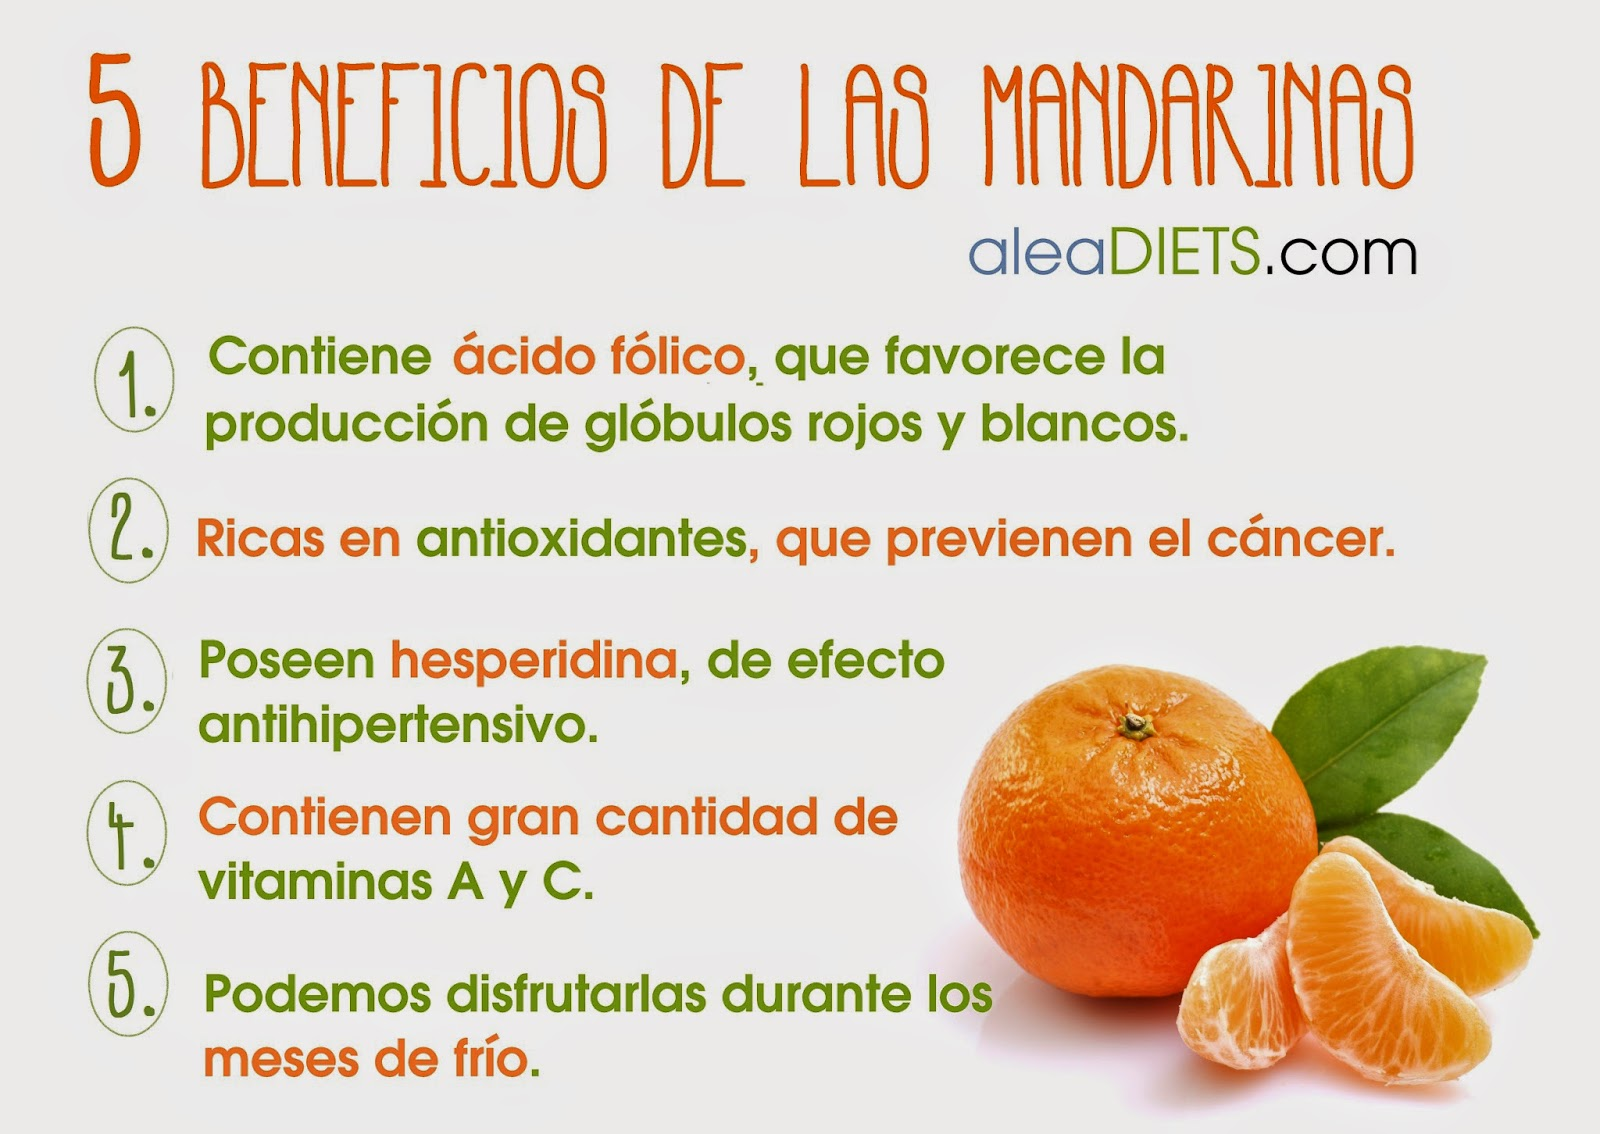 Mandarinas alea